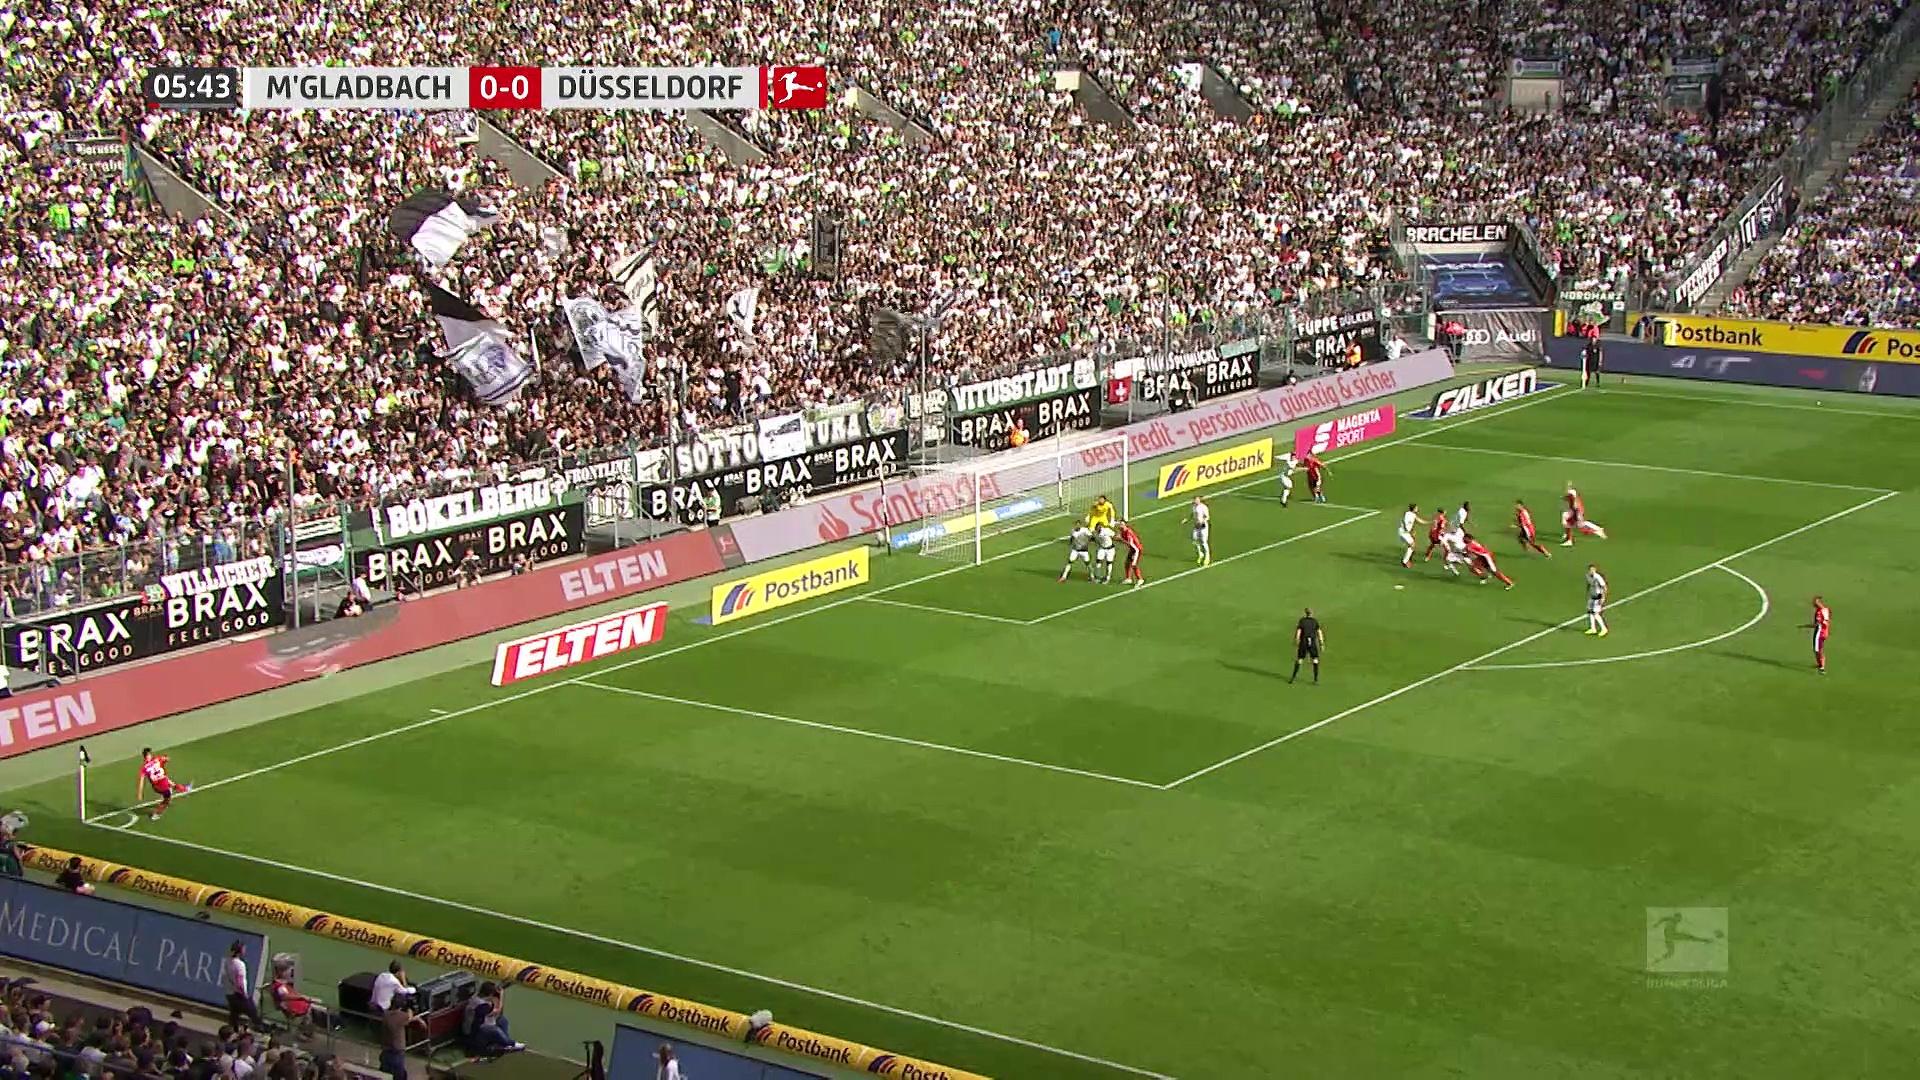 5. Hafta / Borussia Mönchengladbac - Fortuna Düsseldorf: 2-1 (Özet)